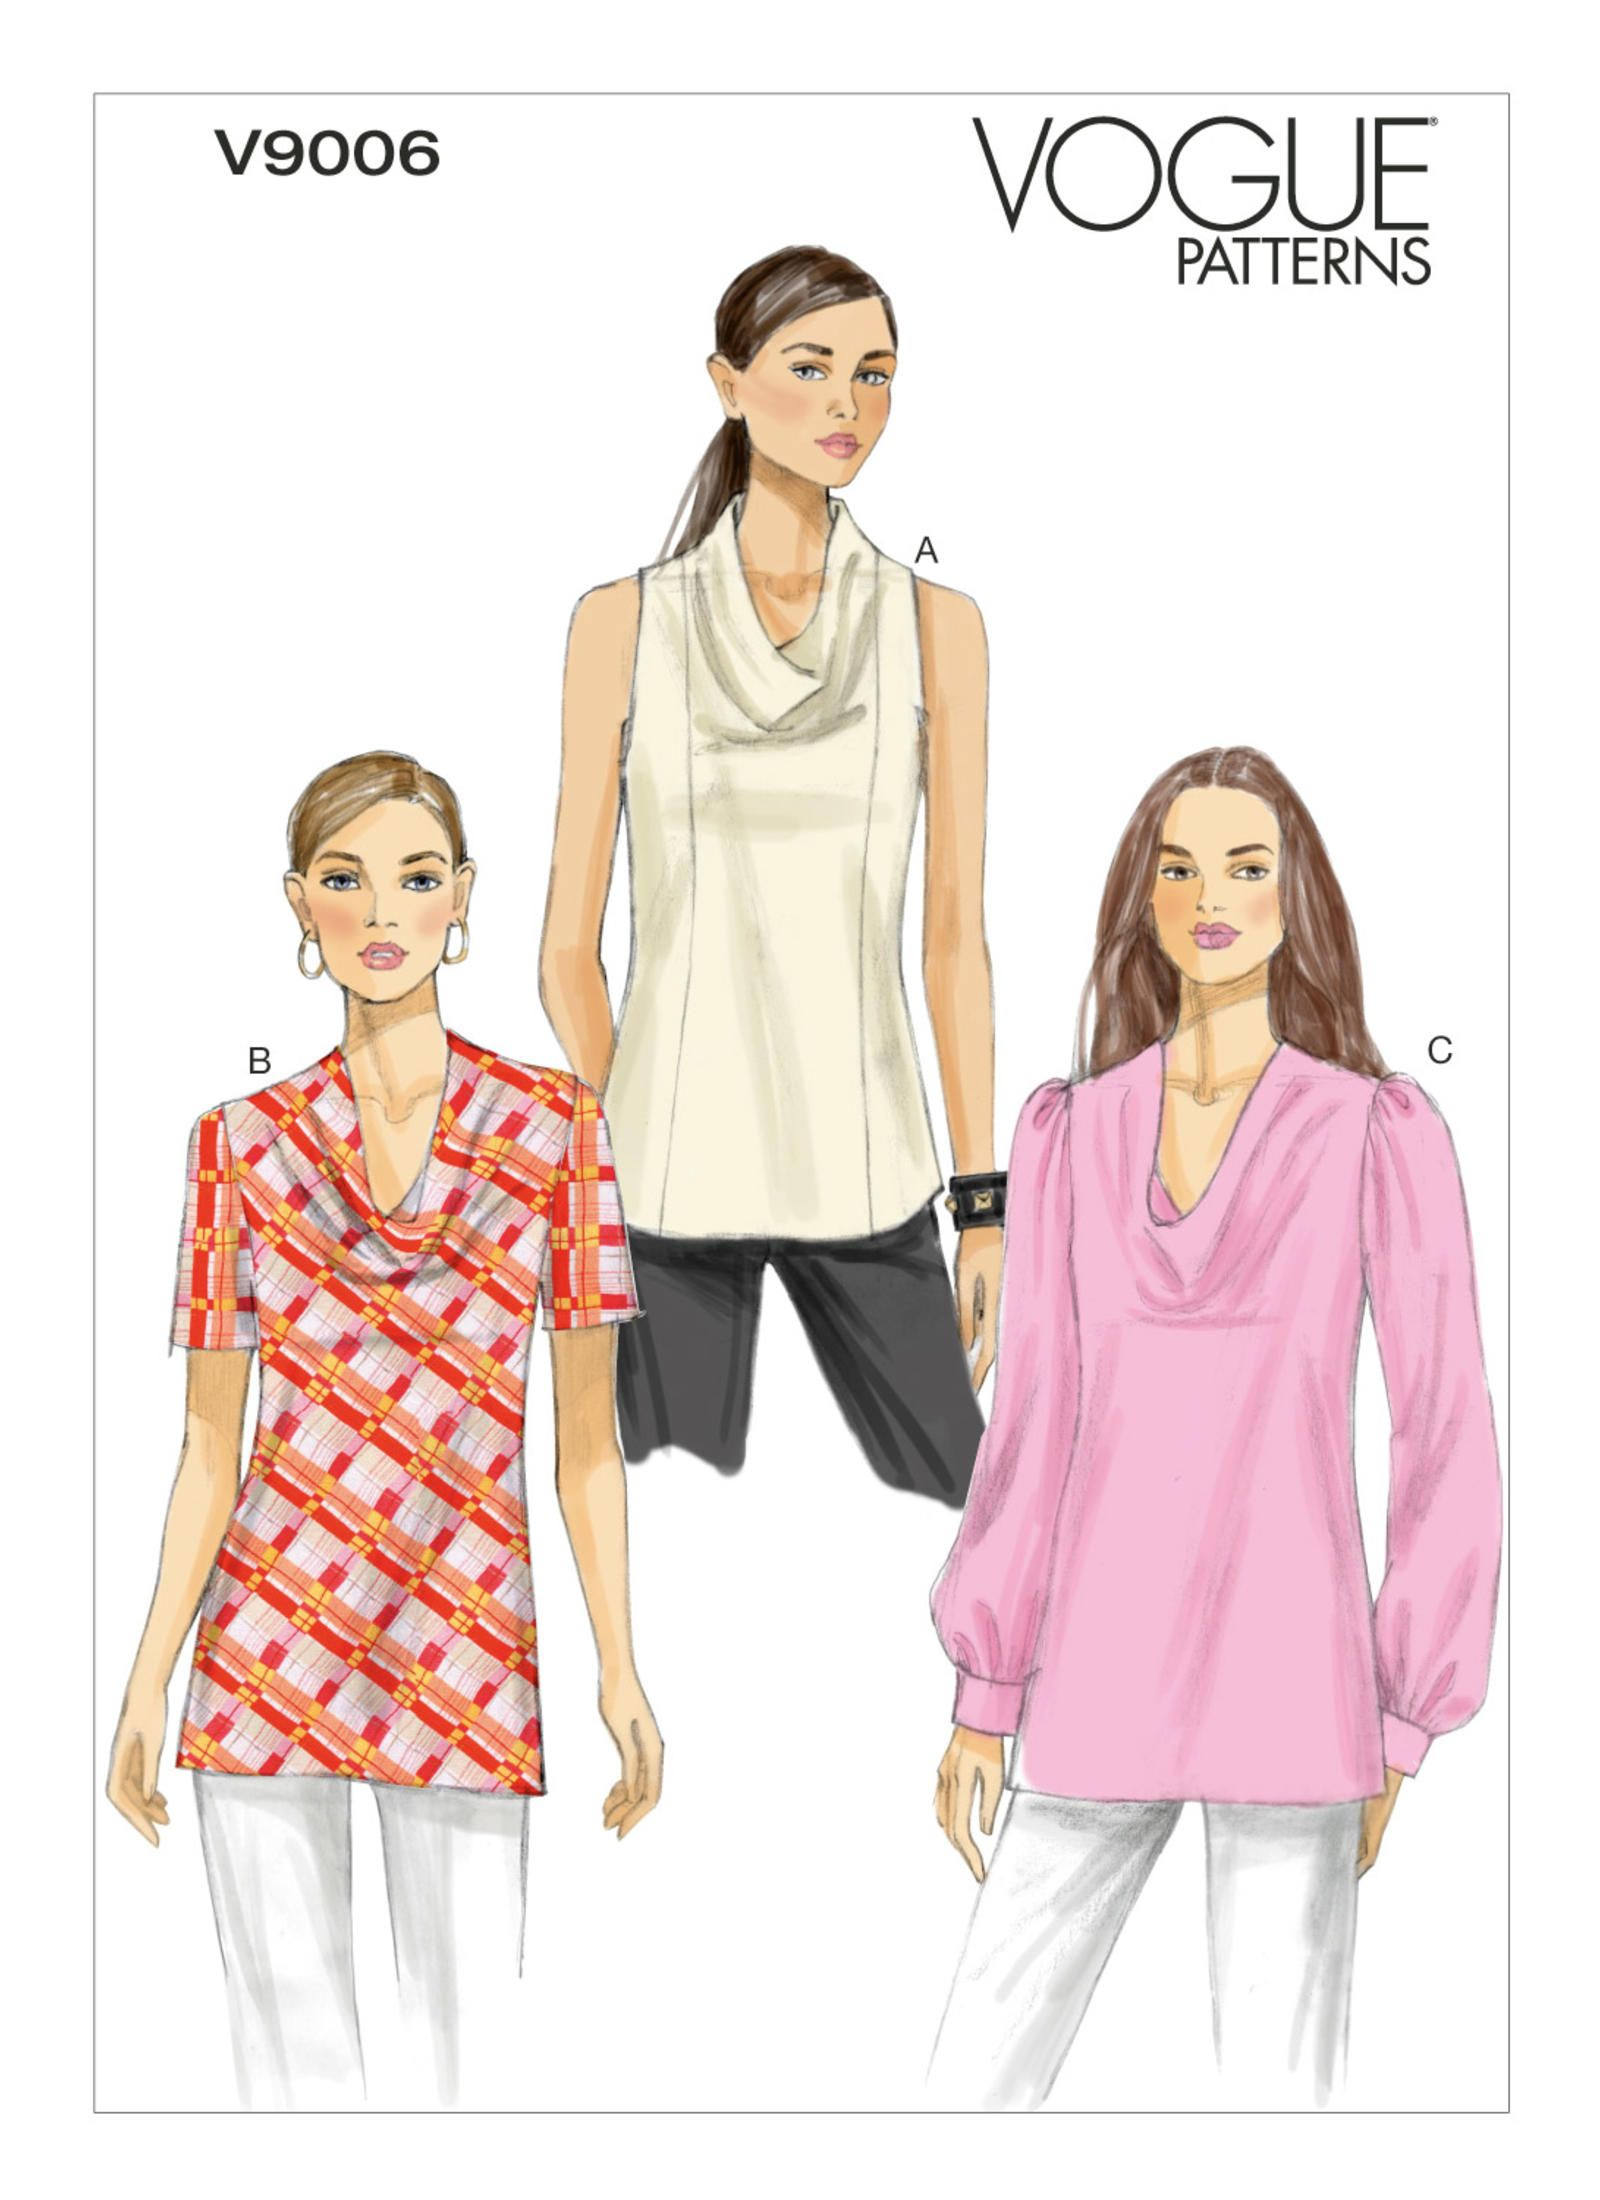 V12   Vogue patterns, Vogue dress patterns, Vogue sewing patterns